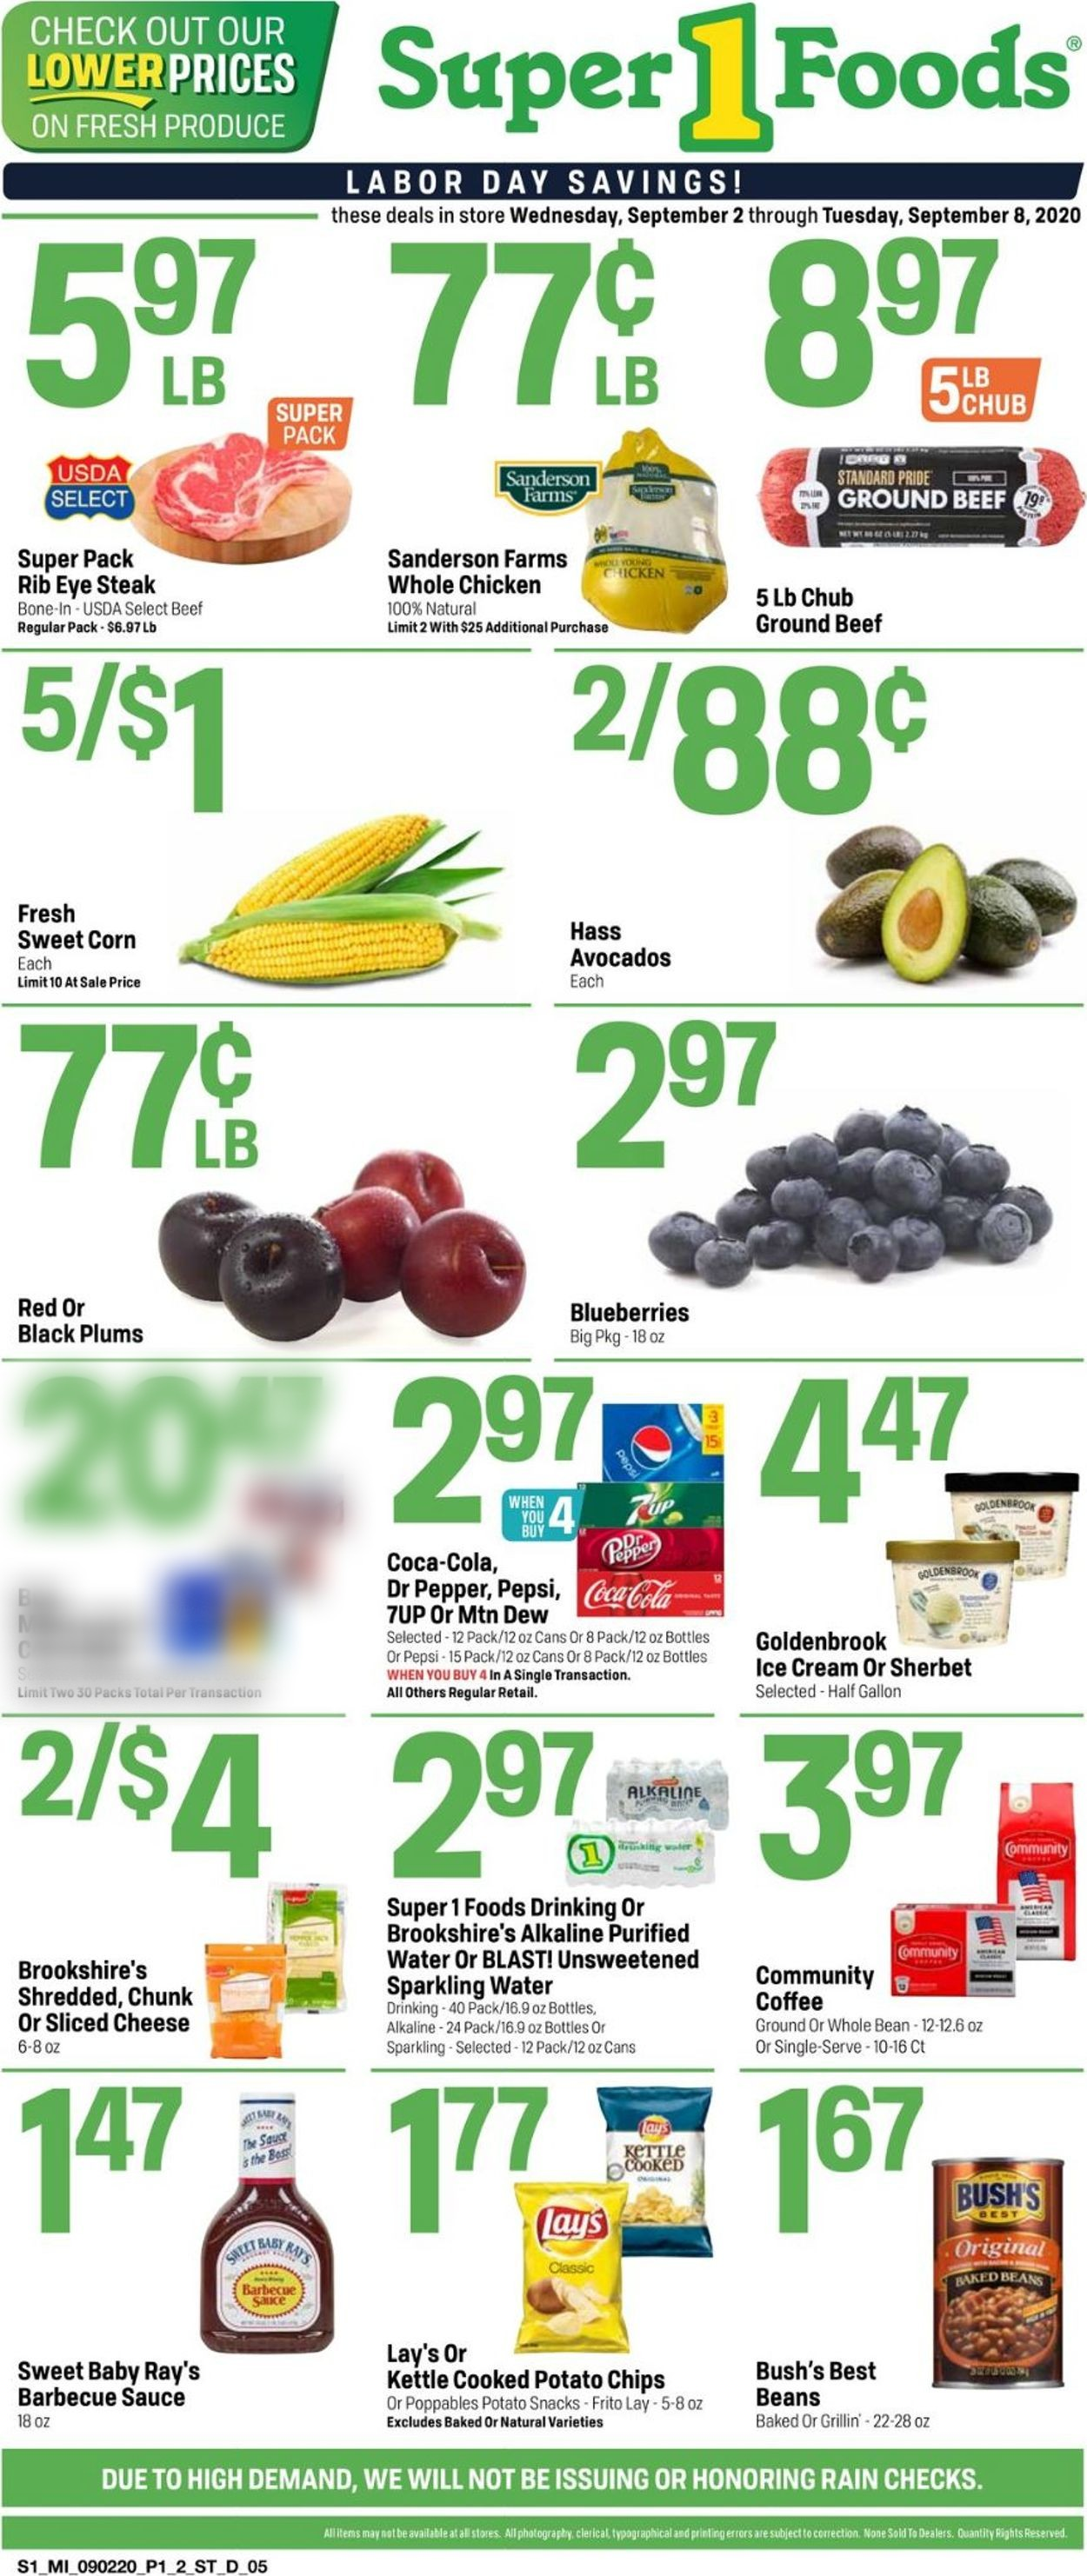 Super 1 Foods Weekly Ad Circular - valid 09/02-09/08/2020